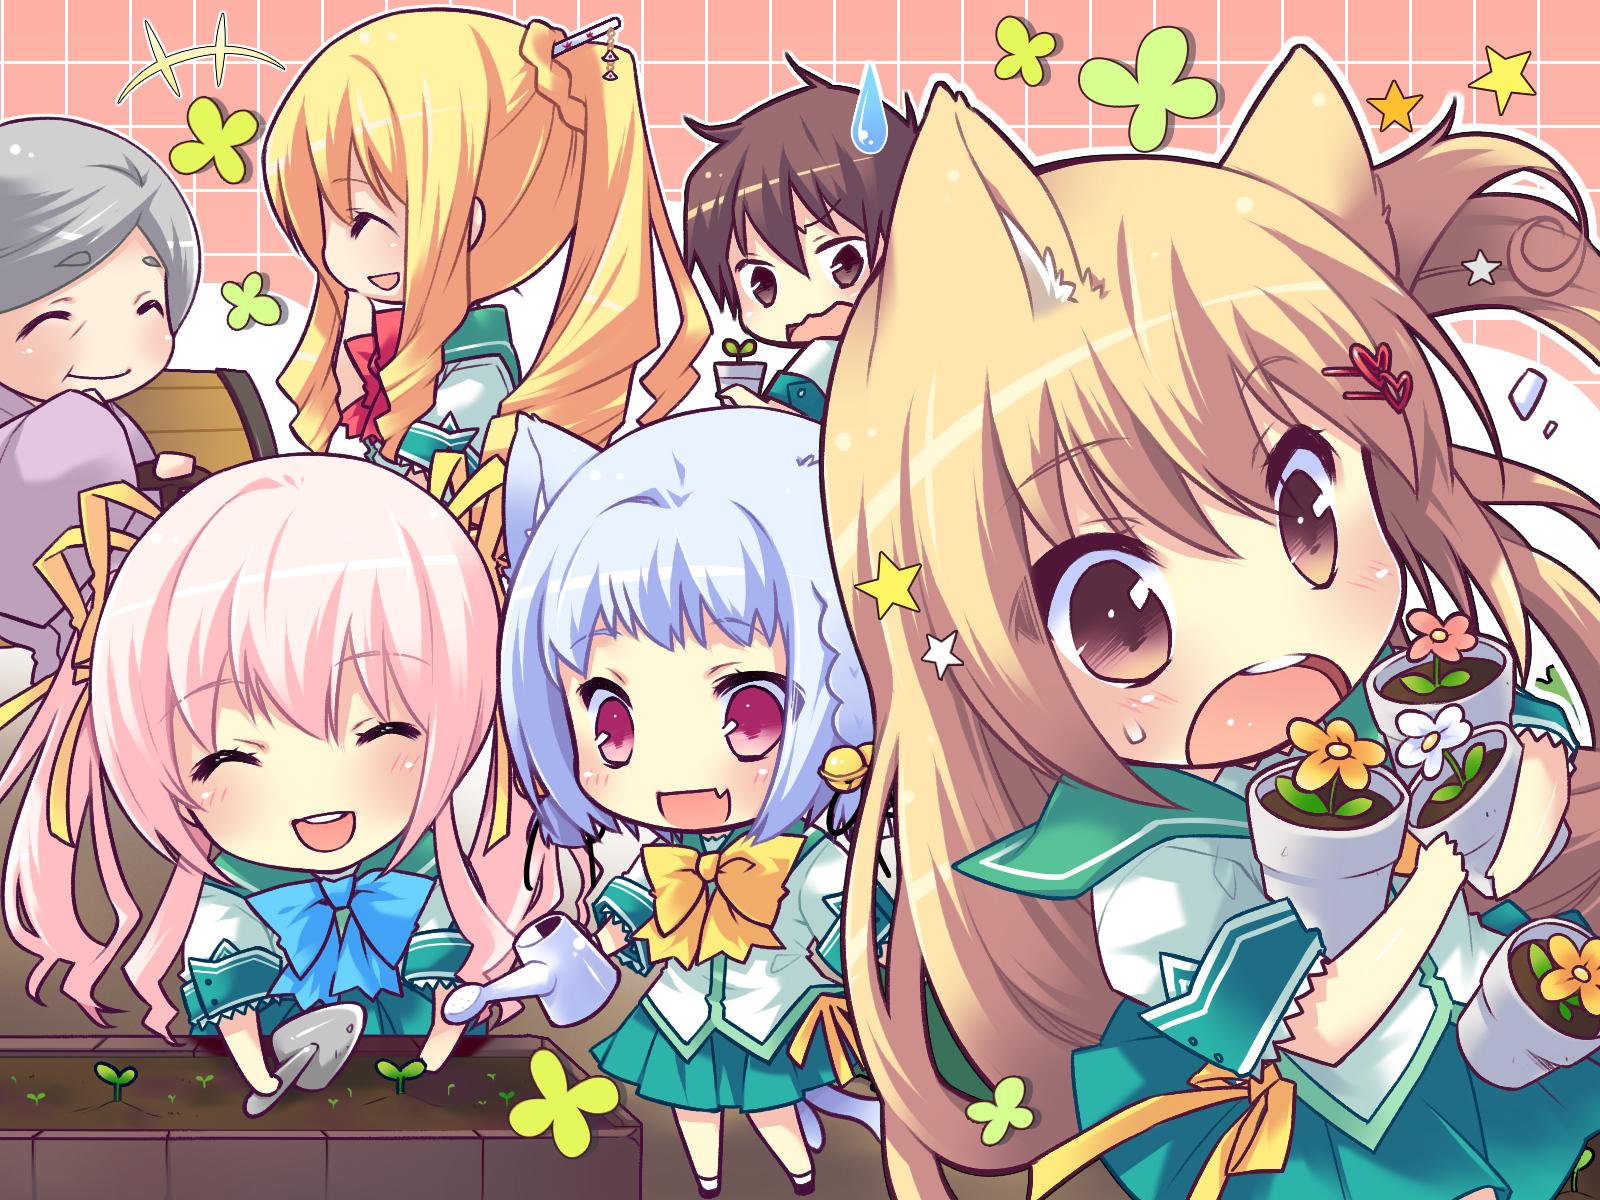 Anime Chibi Wallpaper - WallpaperSafari